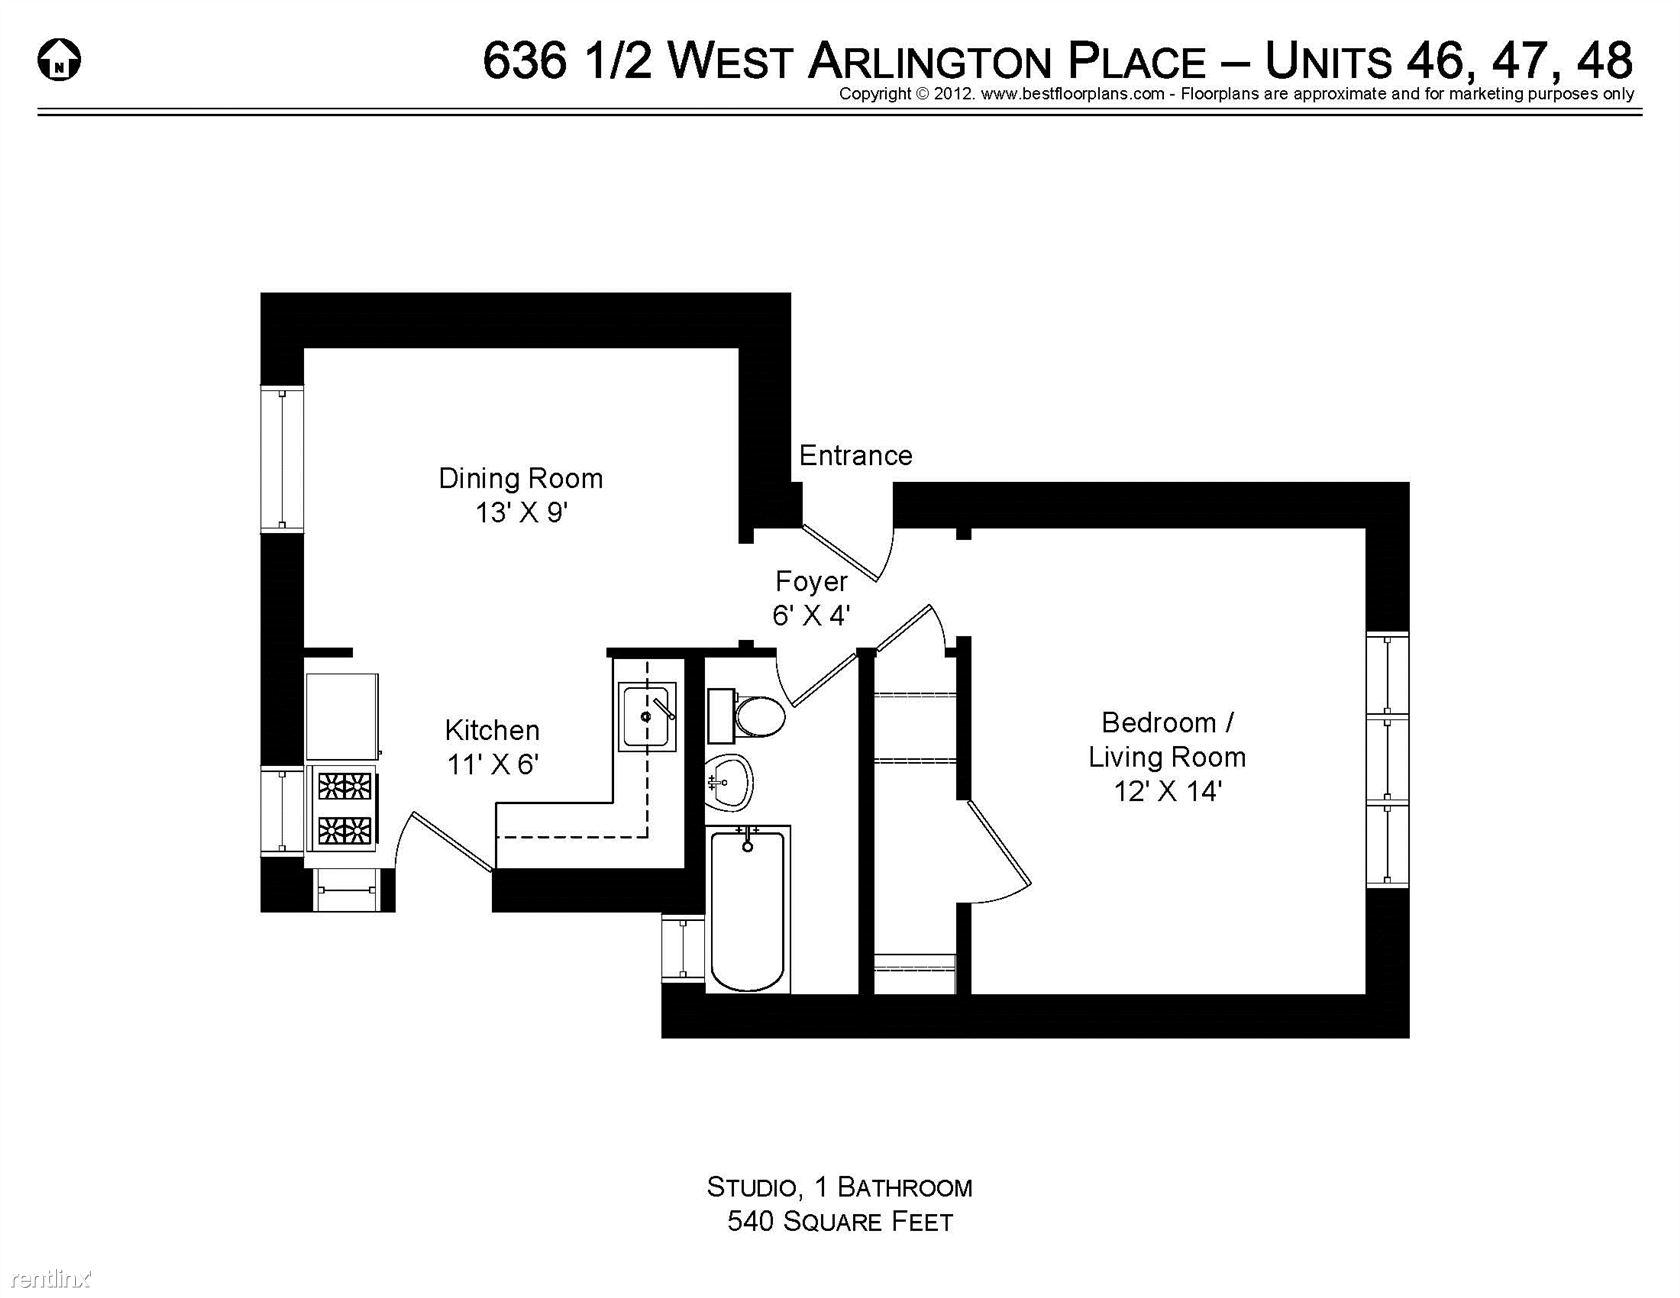 636.5 Arlington 46-48